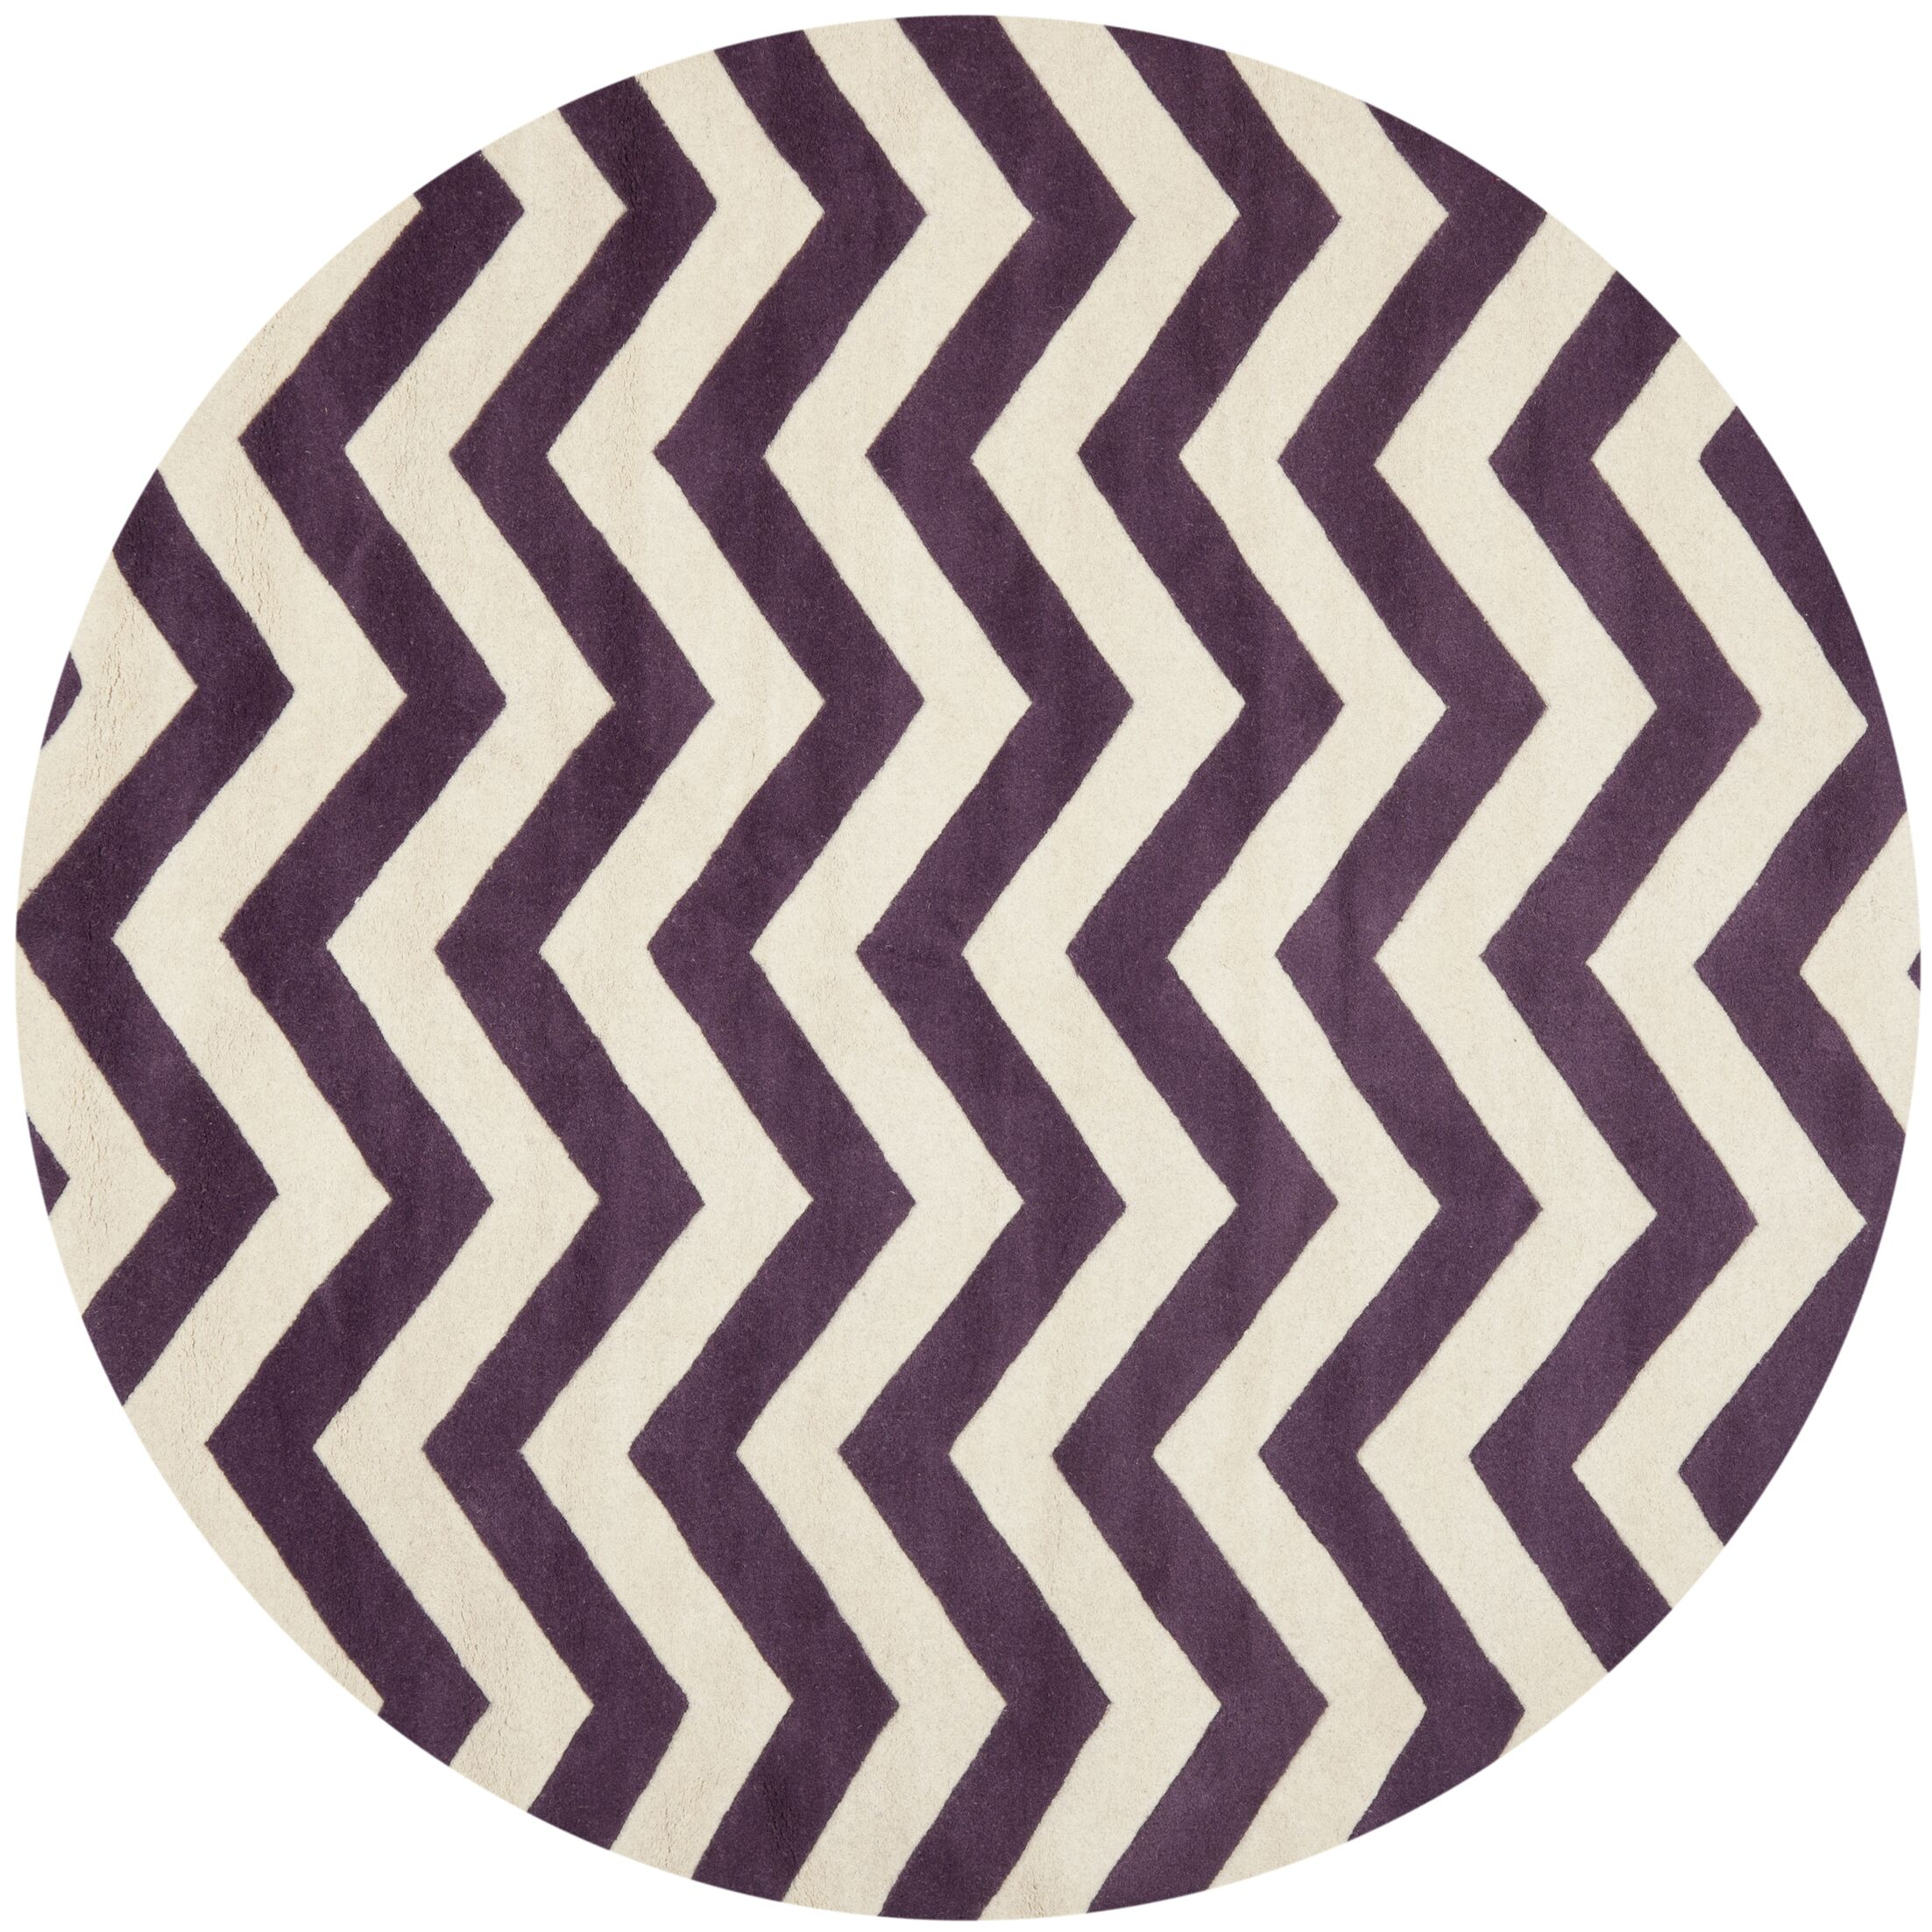 Averett Hand-Tufted Wool Purple/Ivory Area Rug Rug Size: Rectangle 8' x 10'